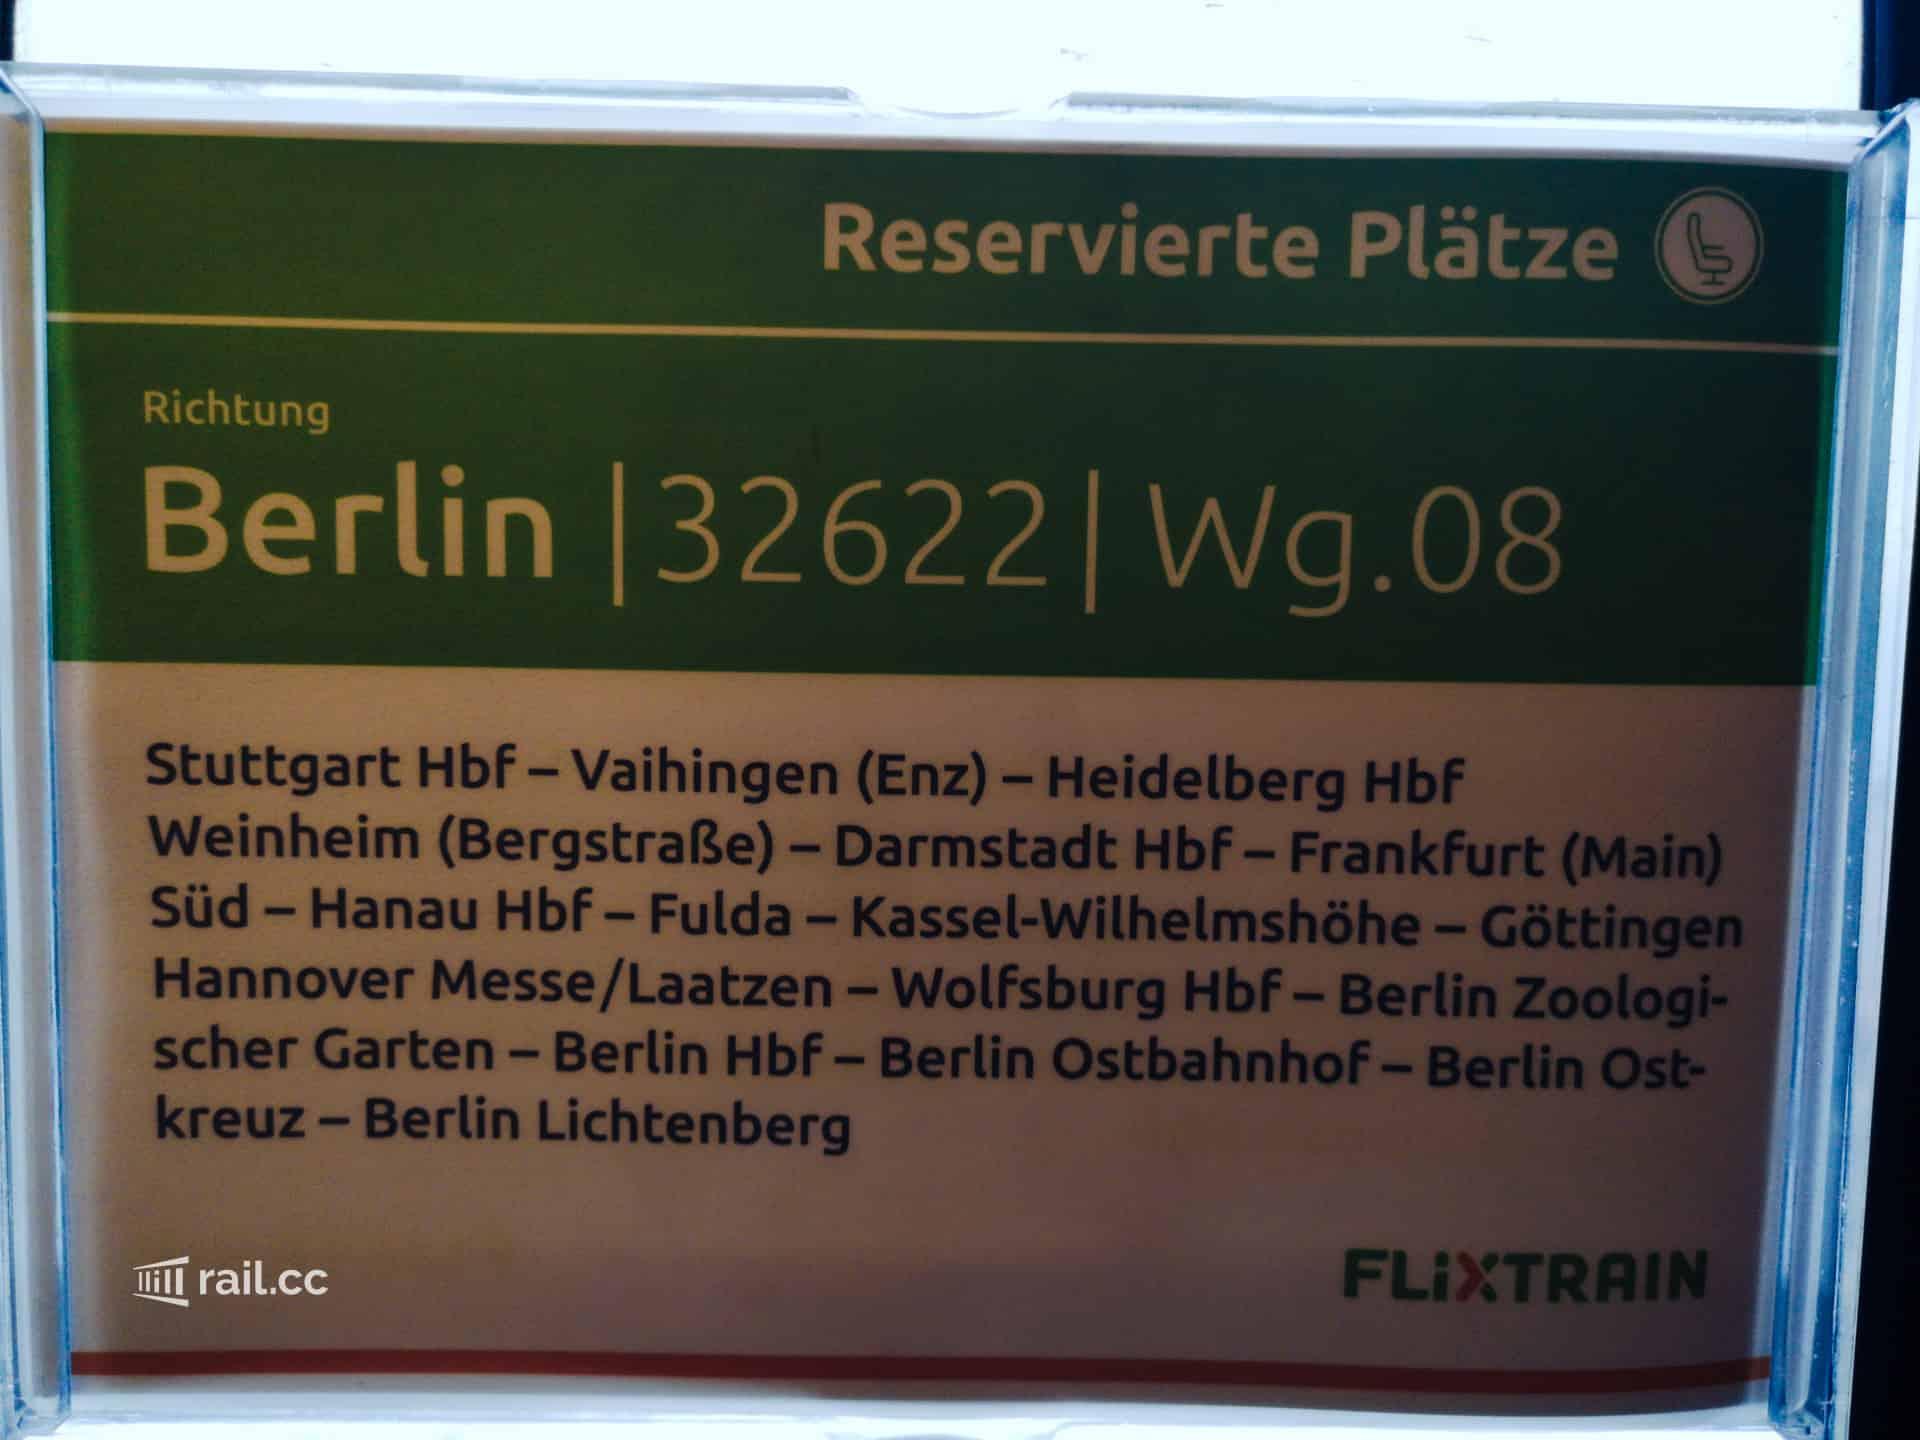 flixtrain frankfurt stuttgart